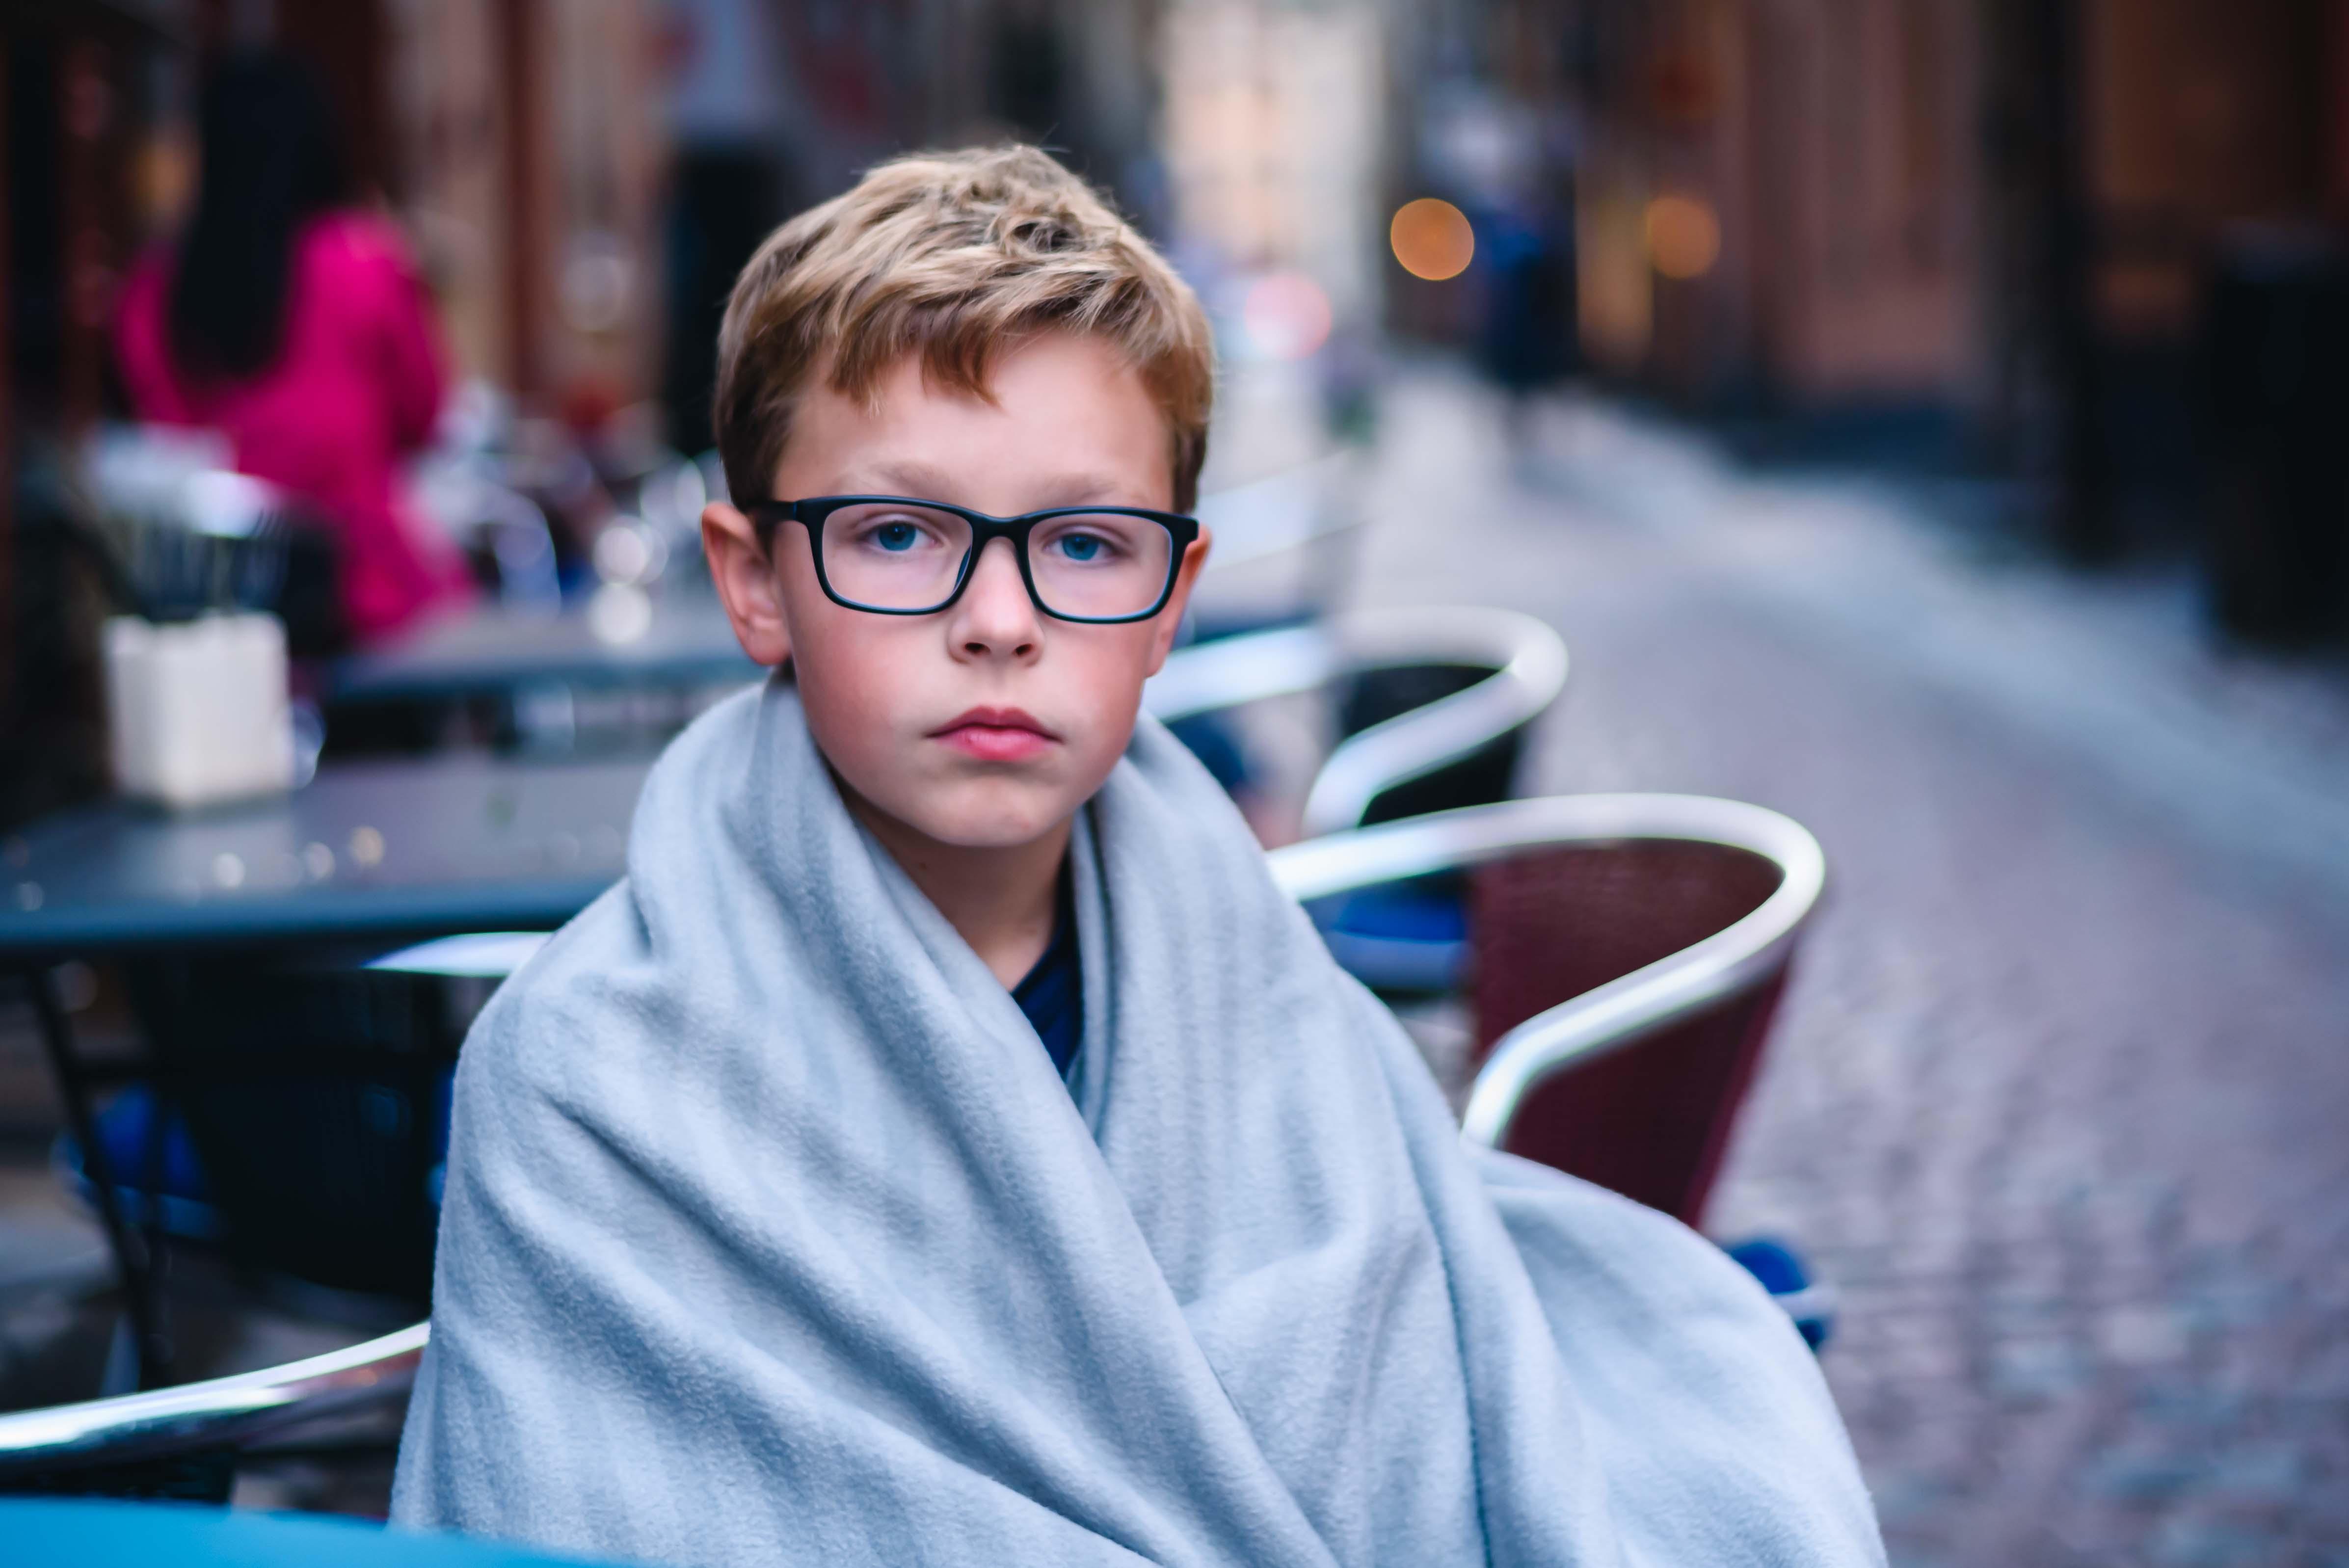 neilson family portrait travel photography boy glasses blanket sweden stockholm gamla stan